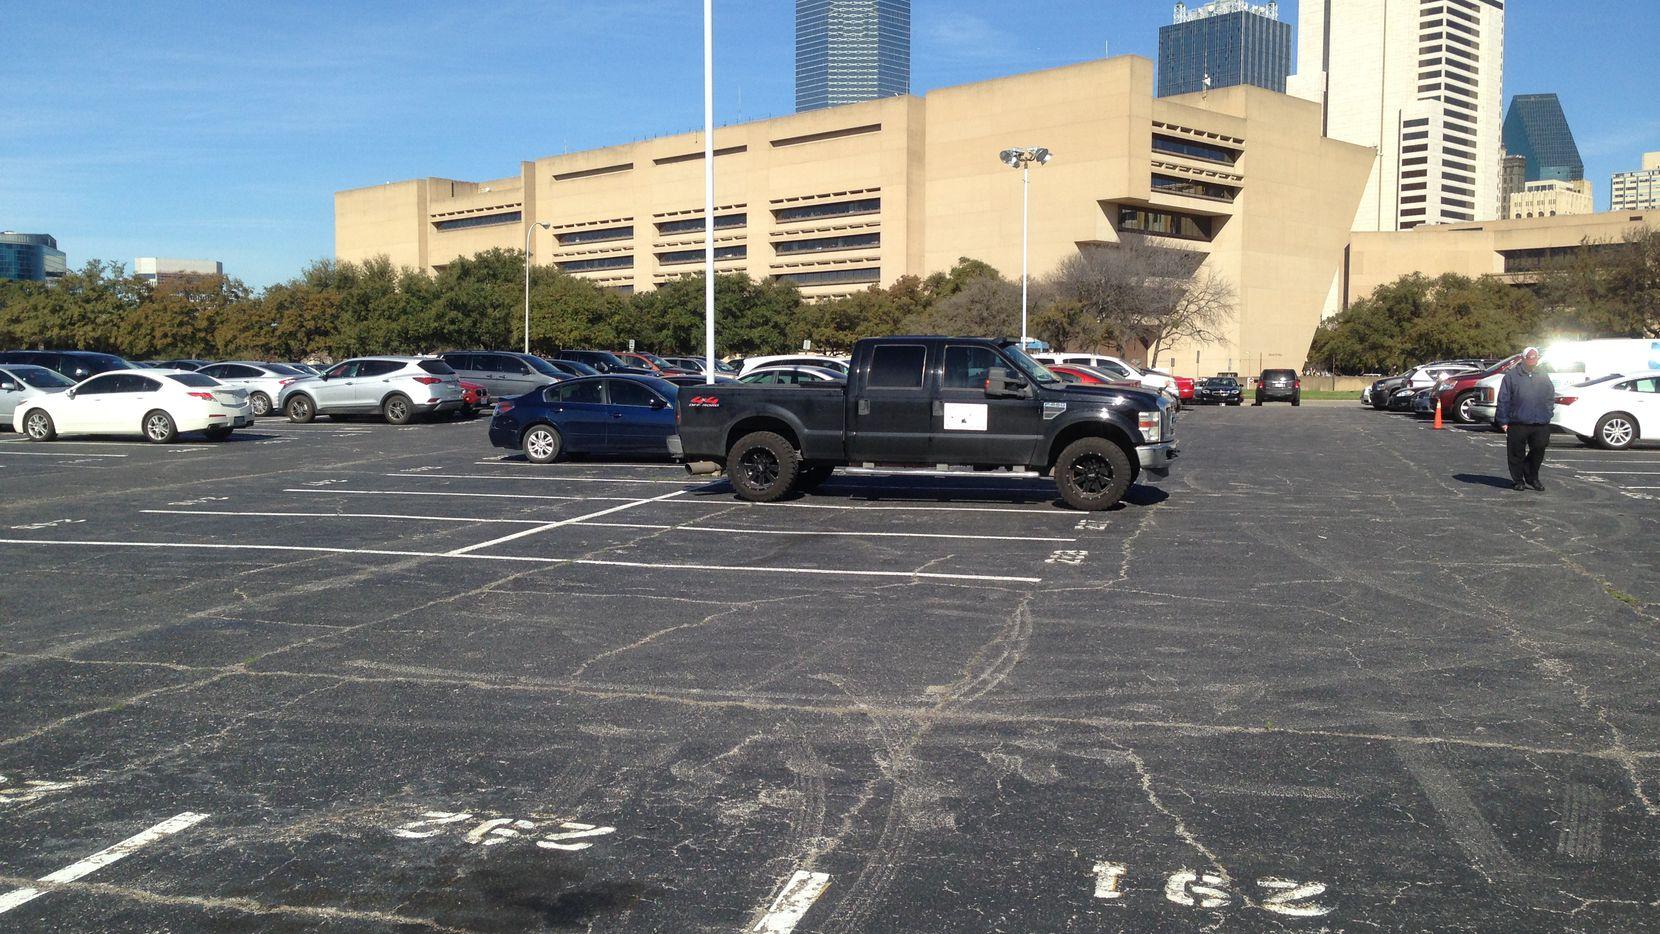 One of three blocks businessman Mike Hoque bought near Dallas' City Hall for future development.